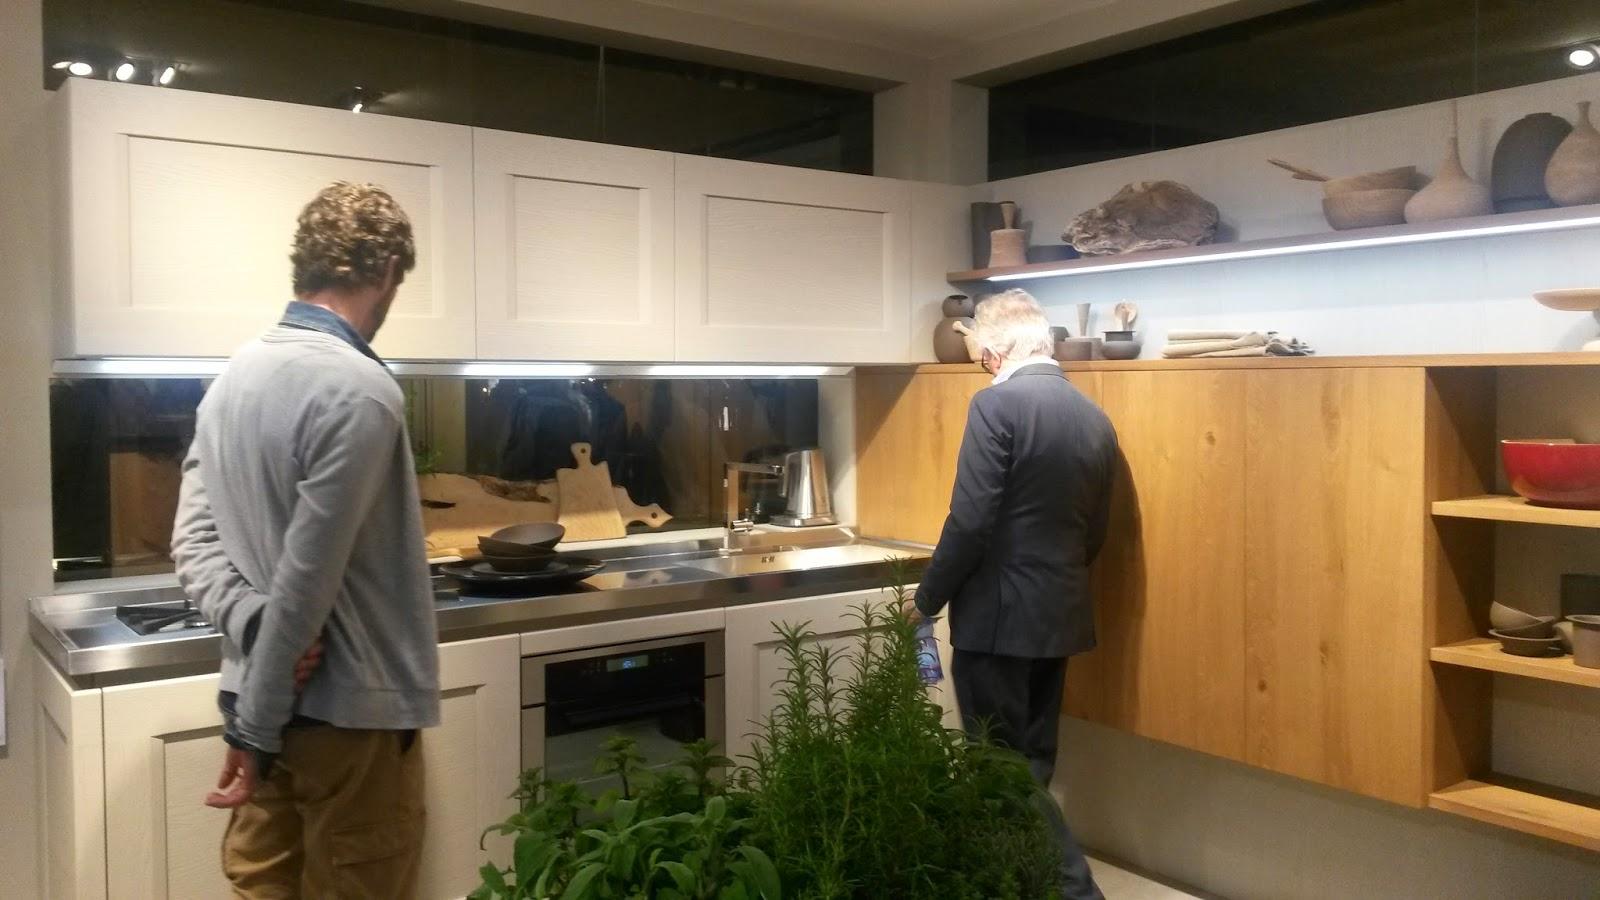 Veneta Grandi Cucine | Cucina Con Vetrina Soprattutto Classica O In ...